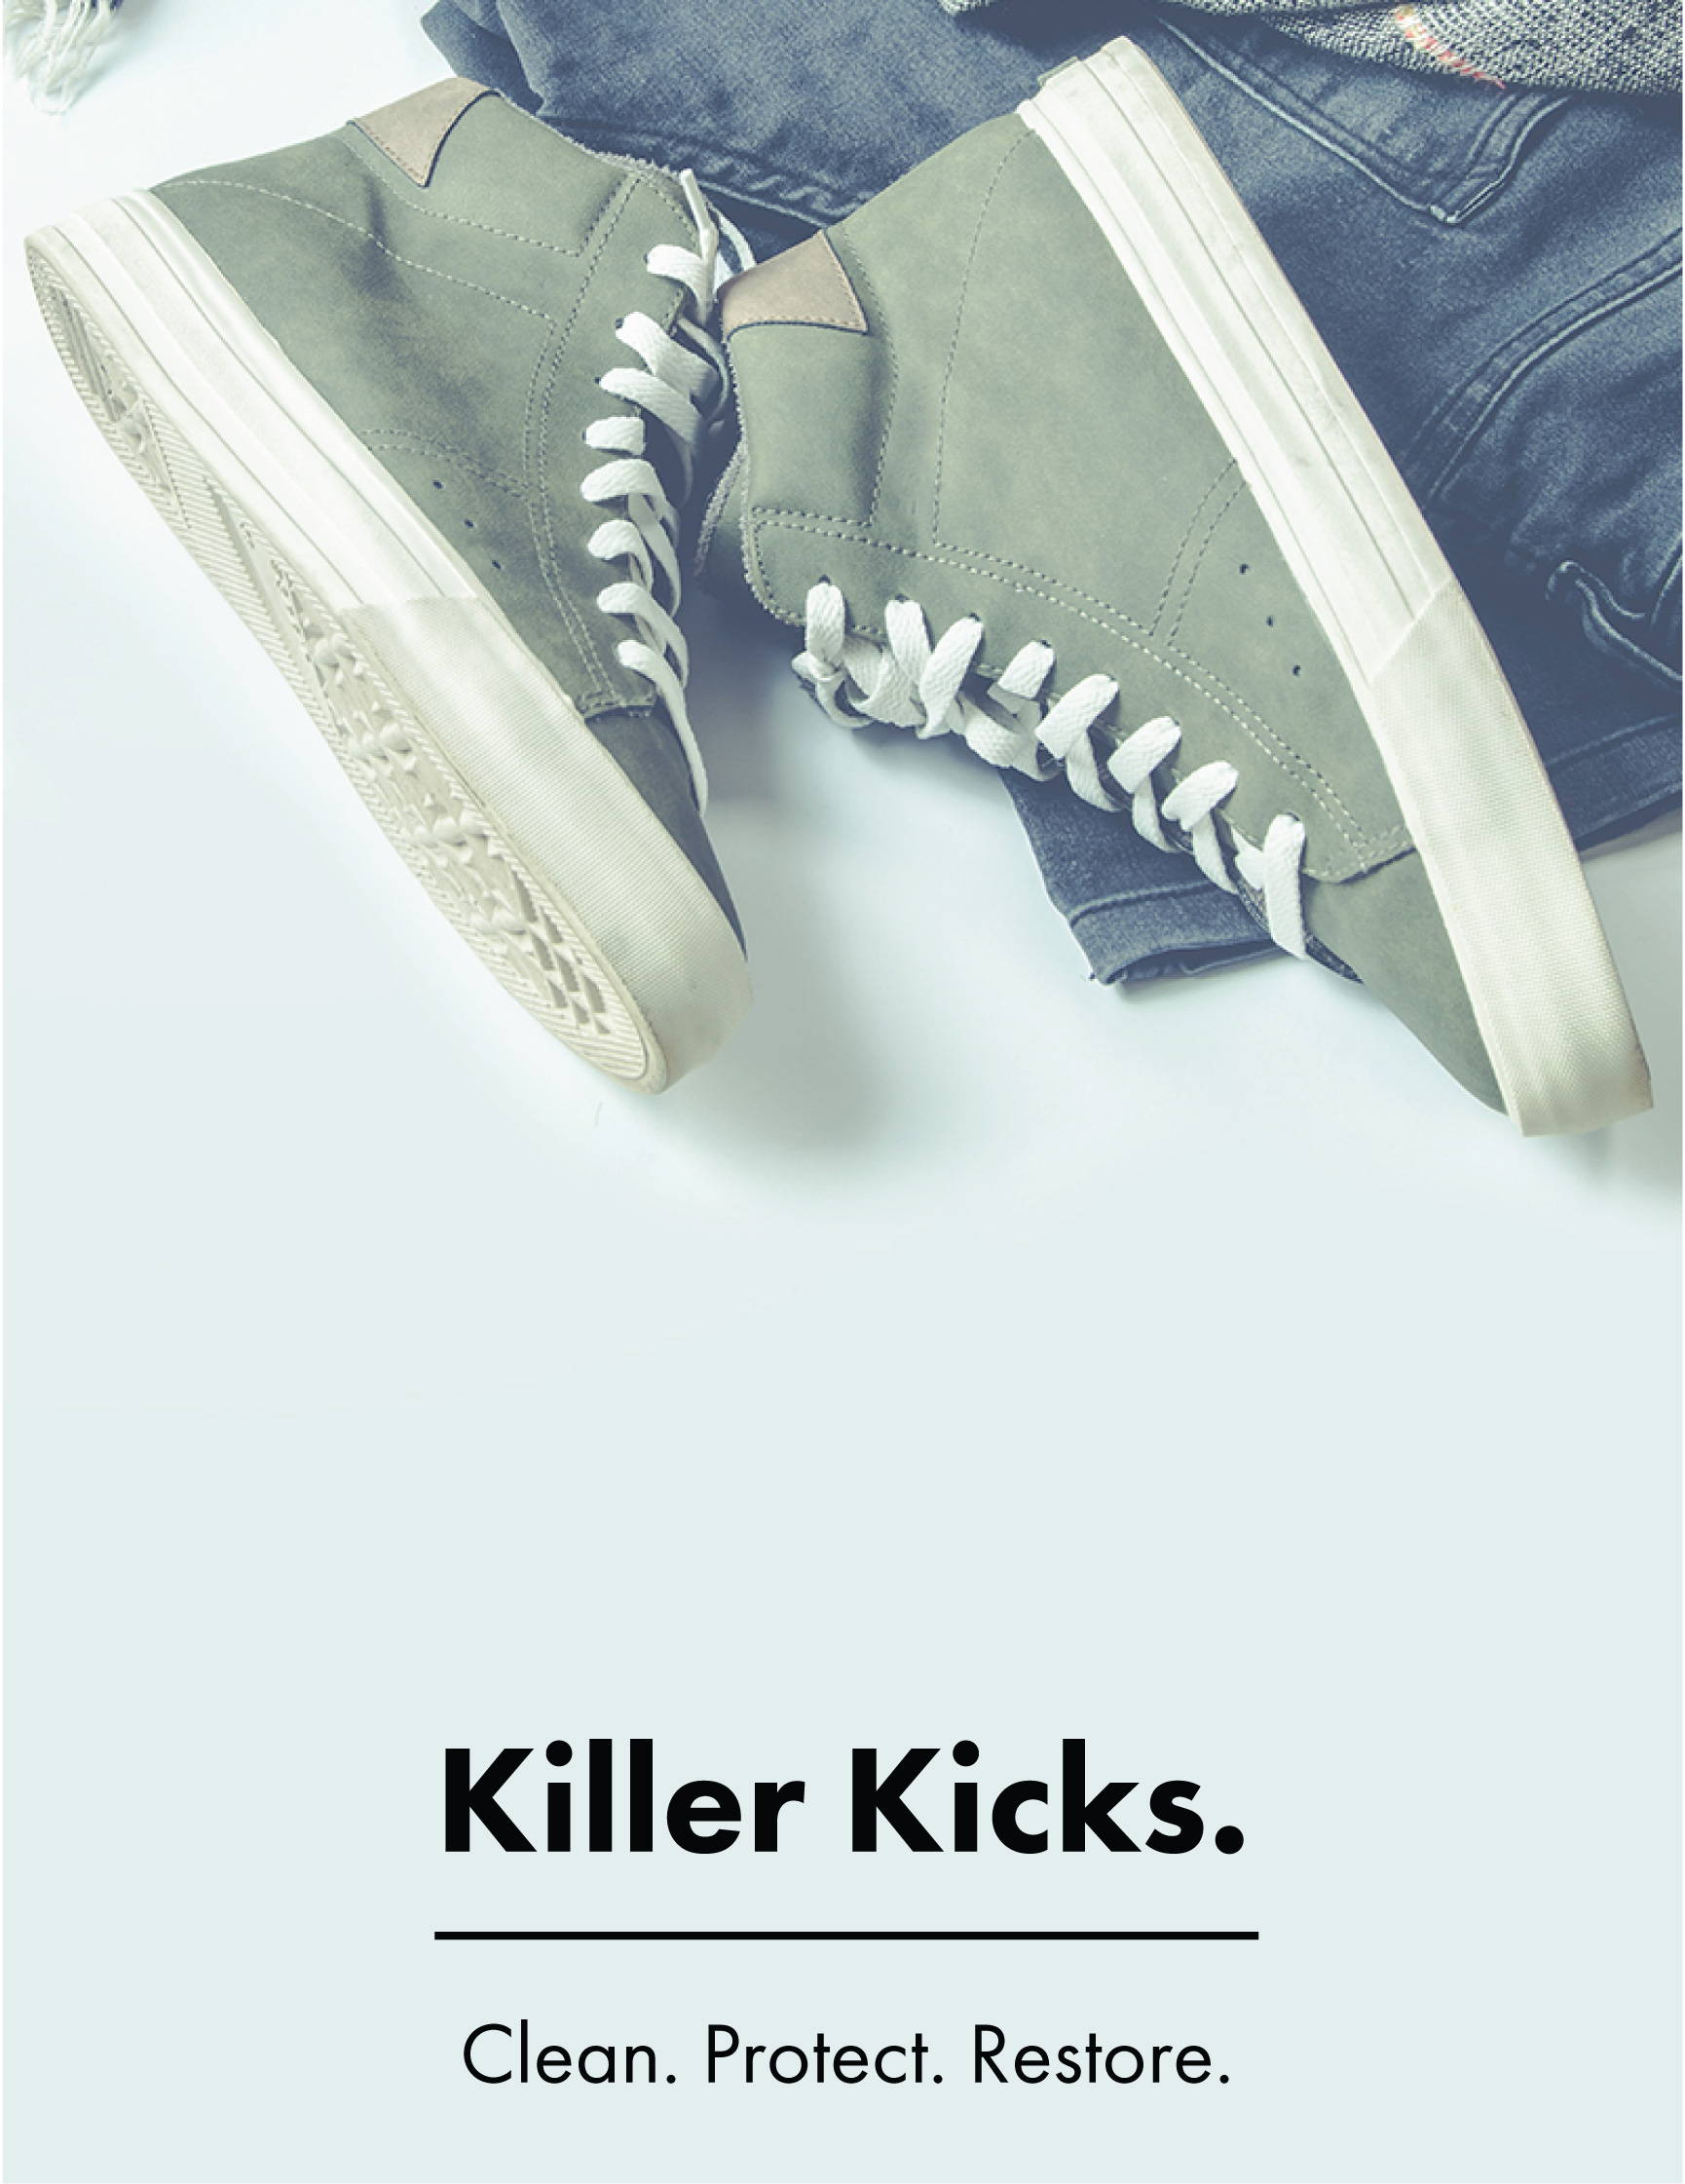 Sneaker gifts